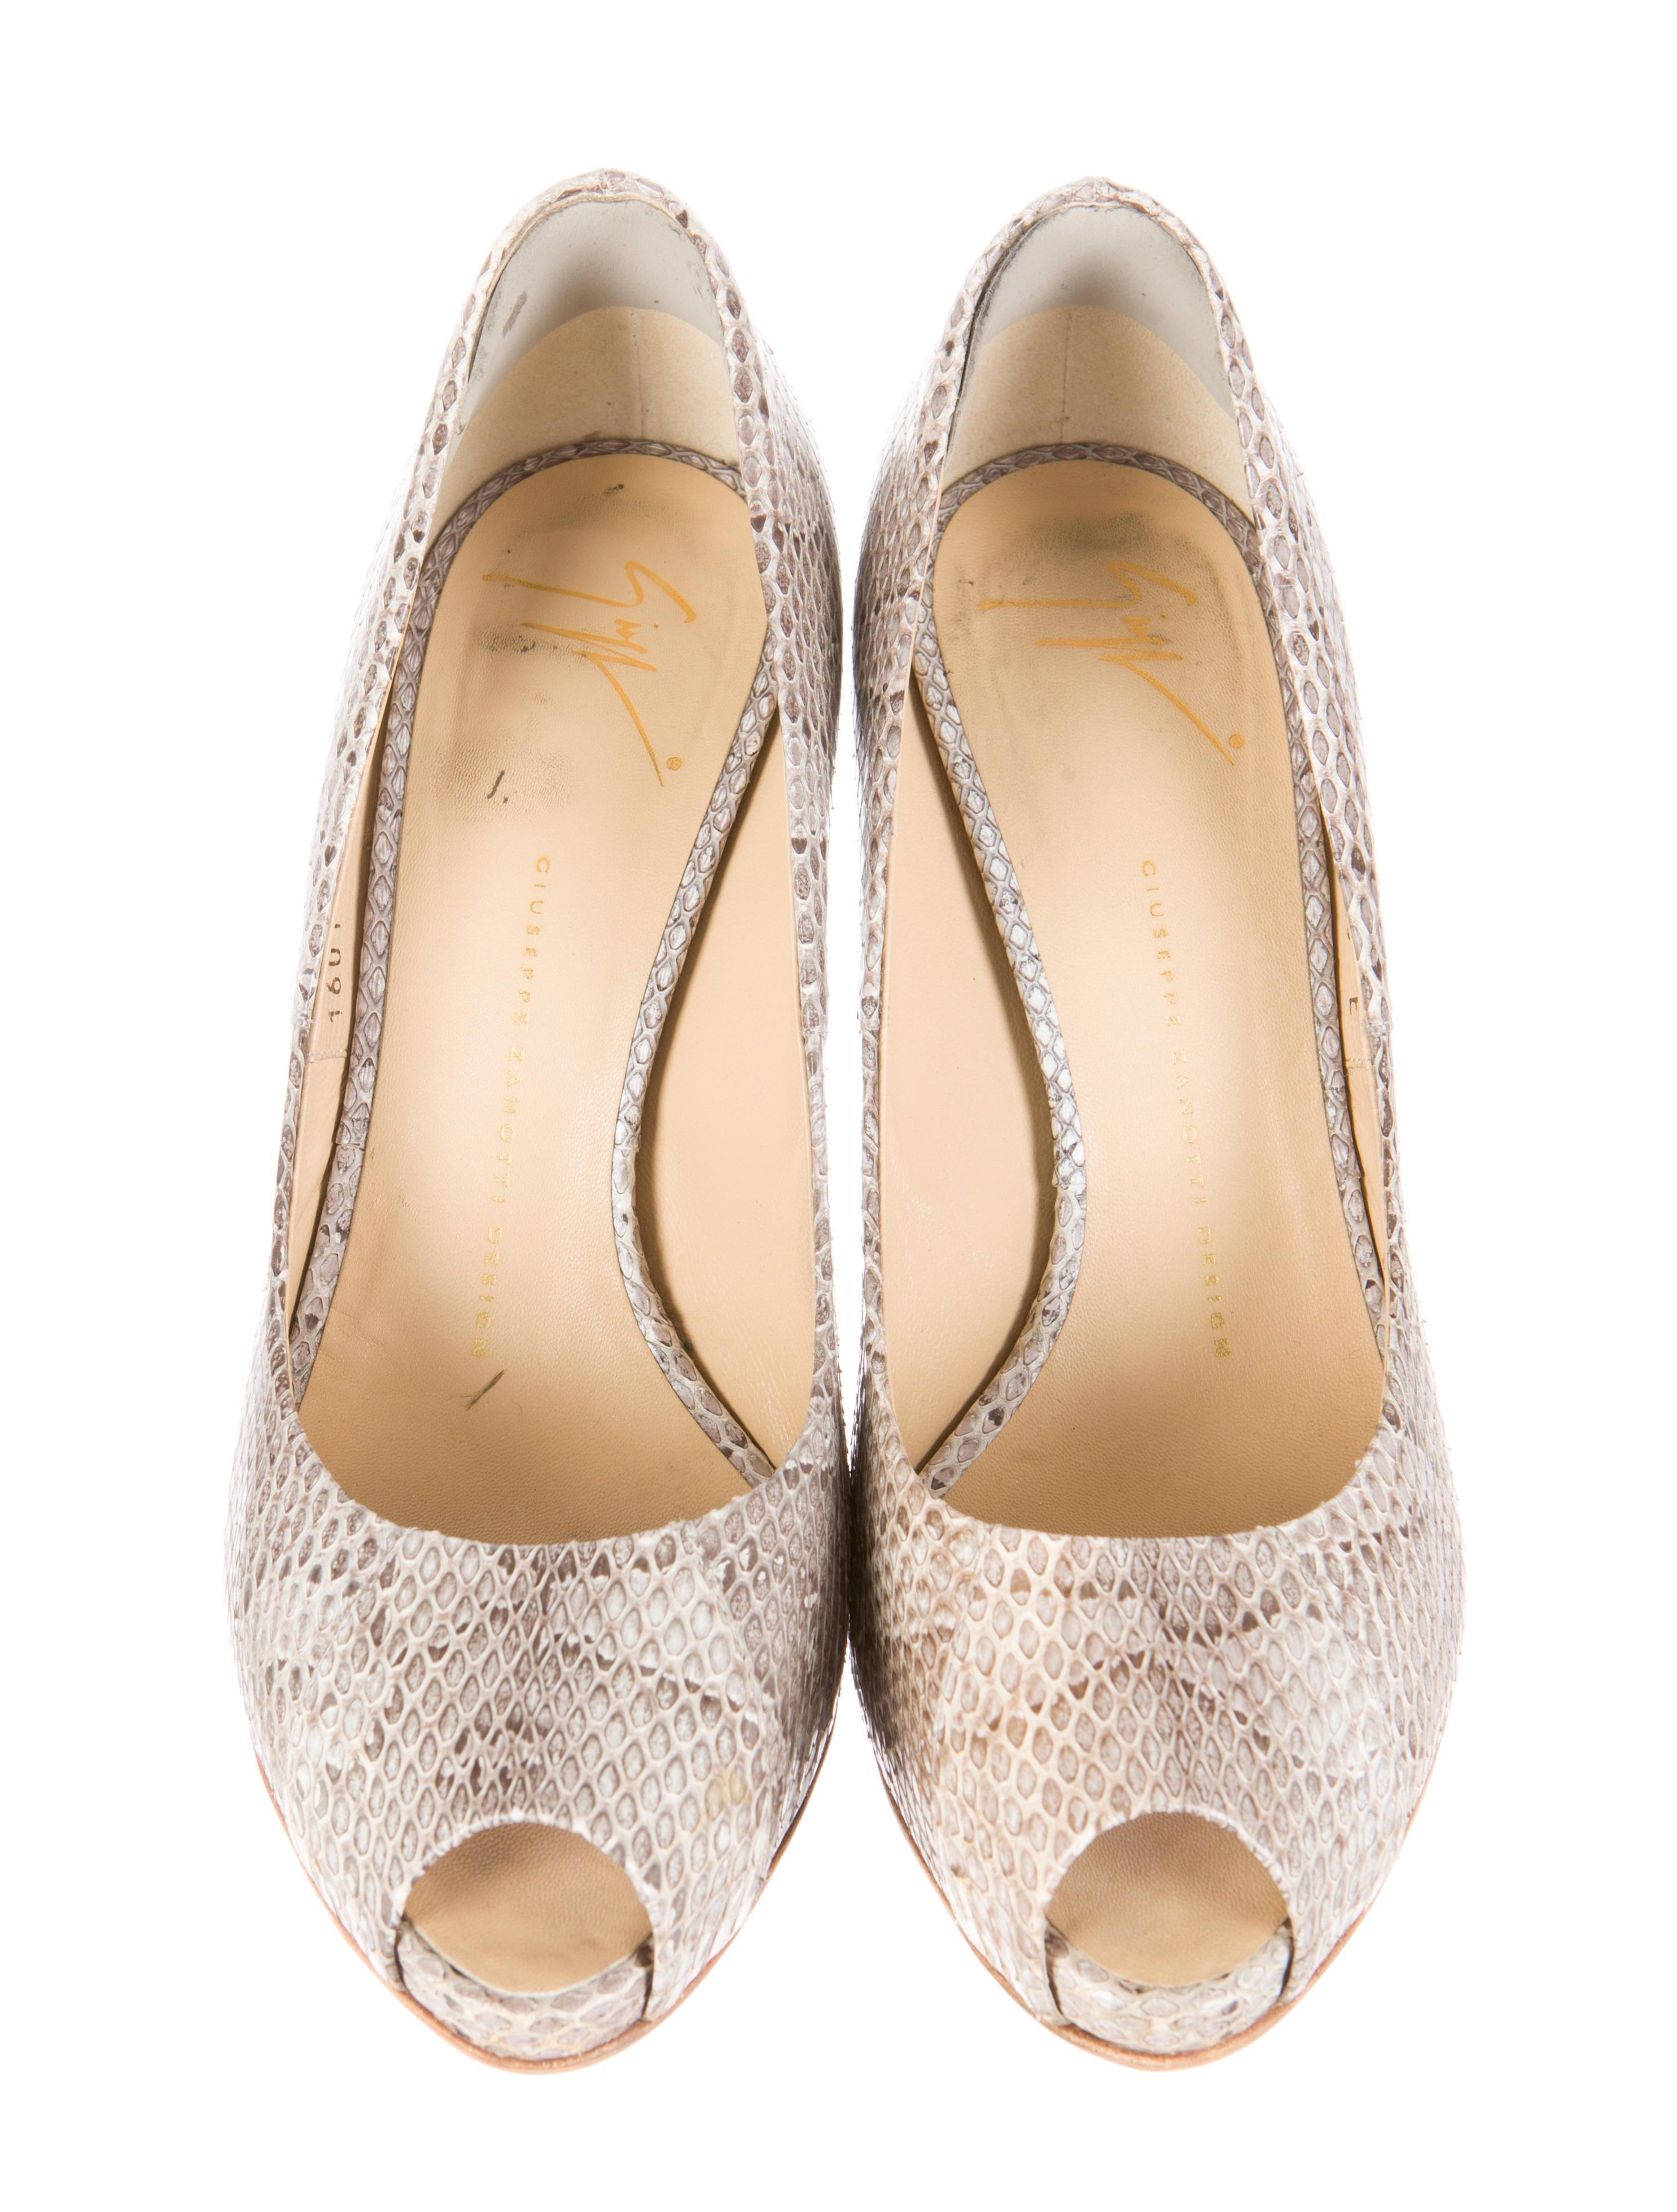 3c2dff7ab Giuseppe Zanotti High Top Wedge Women Shoe